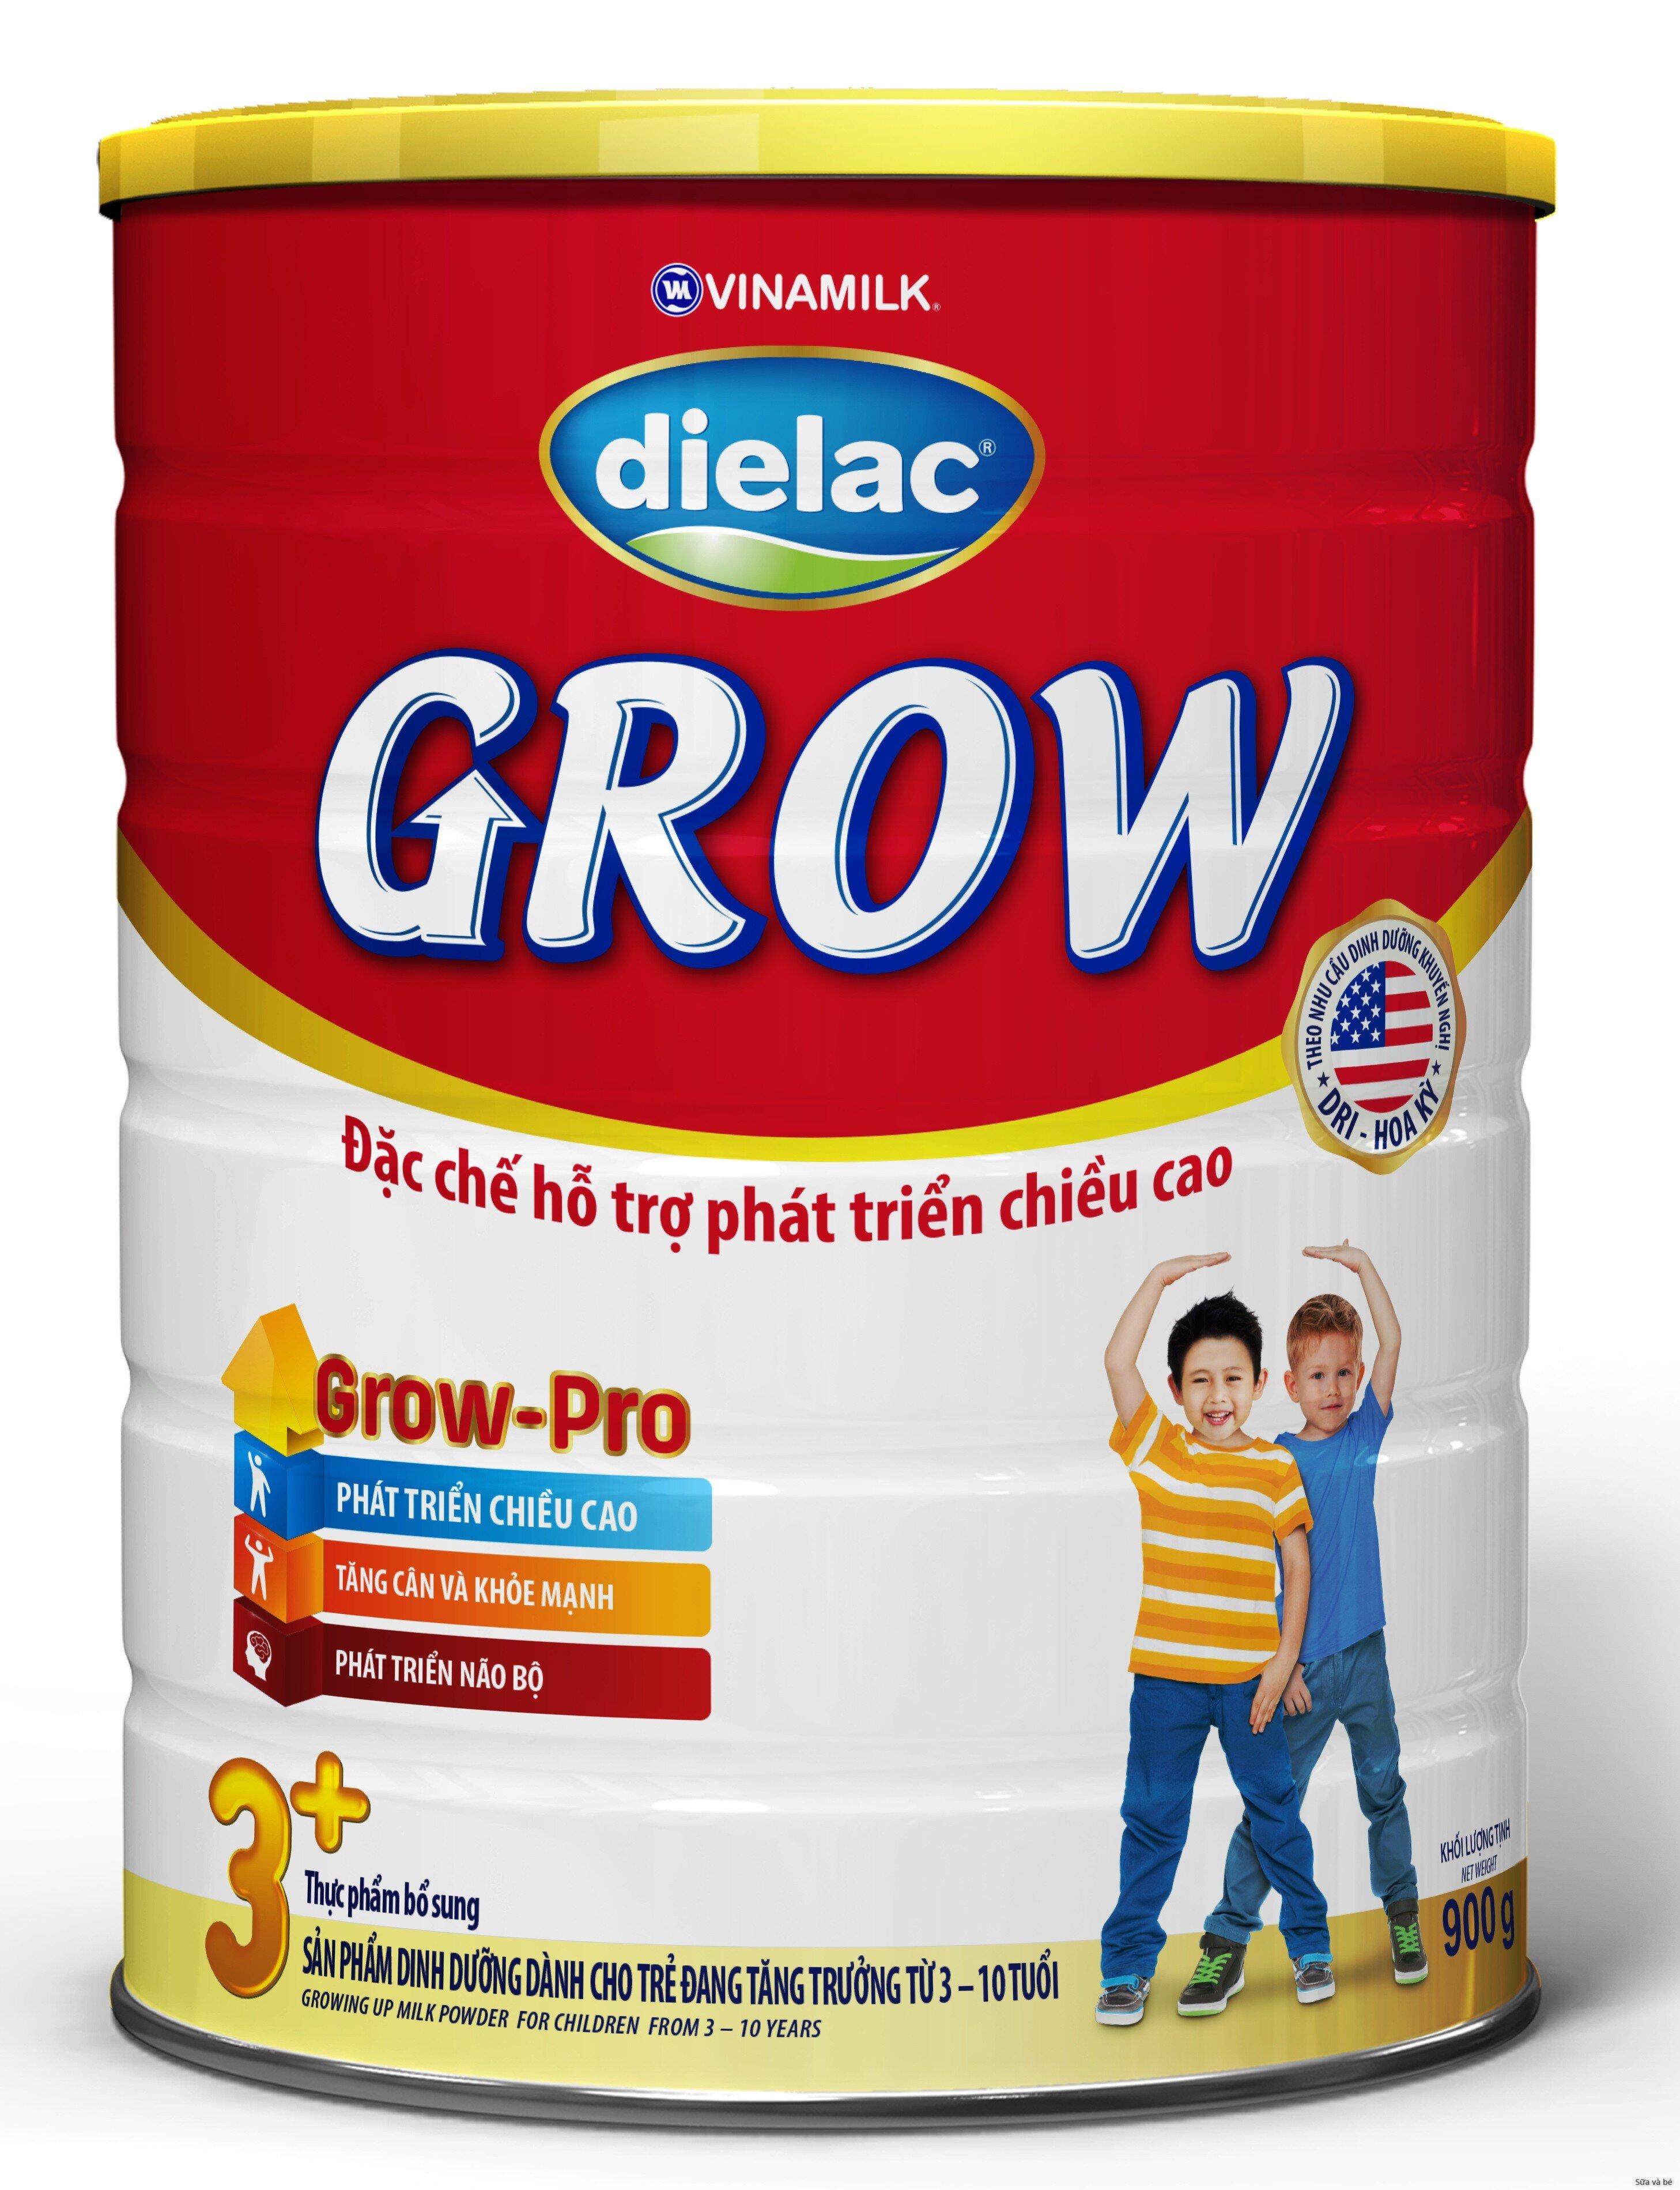 Cách pha sữa bột Vinamilk Dielac Grow